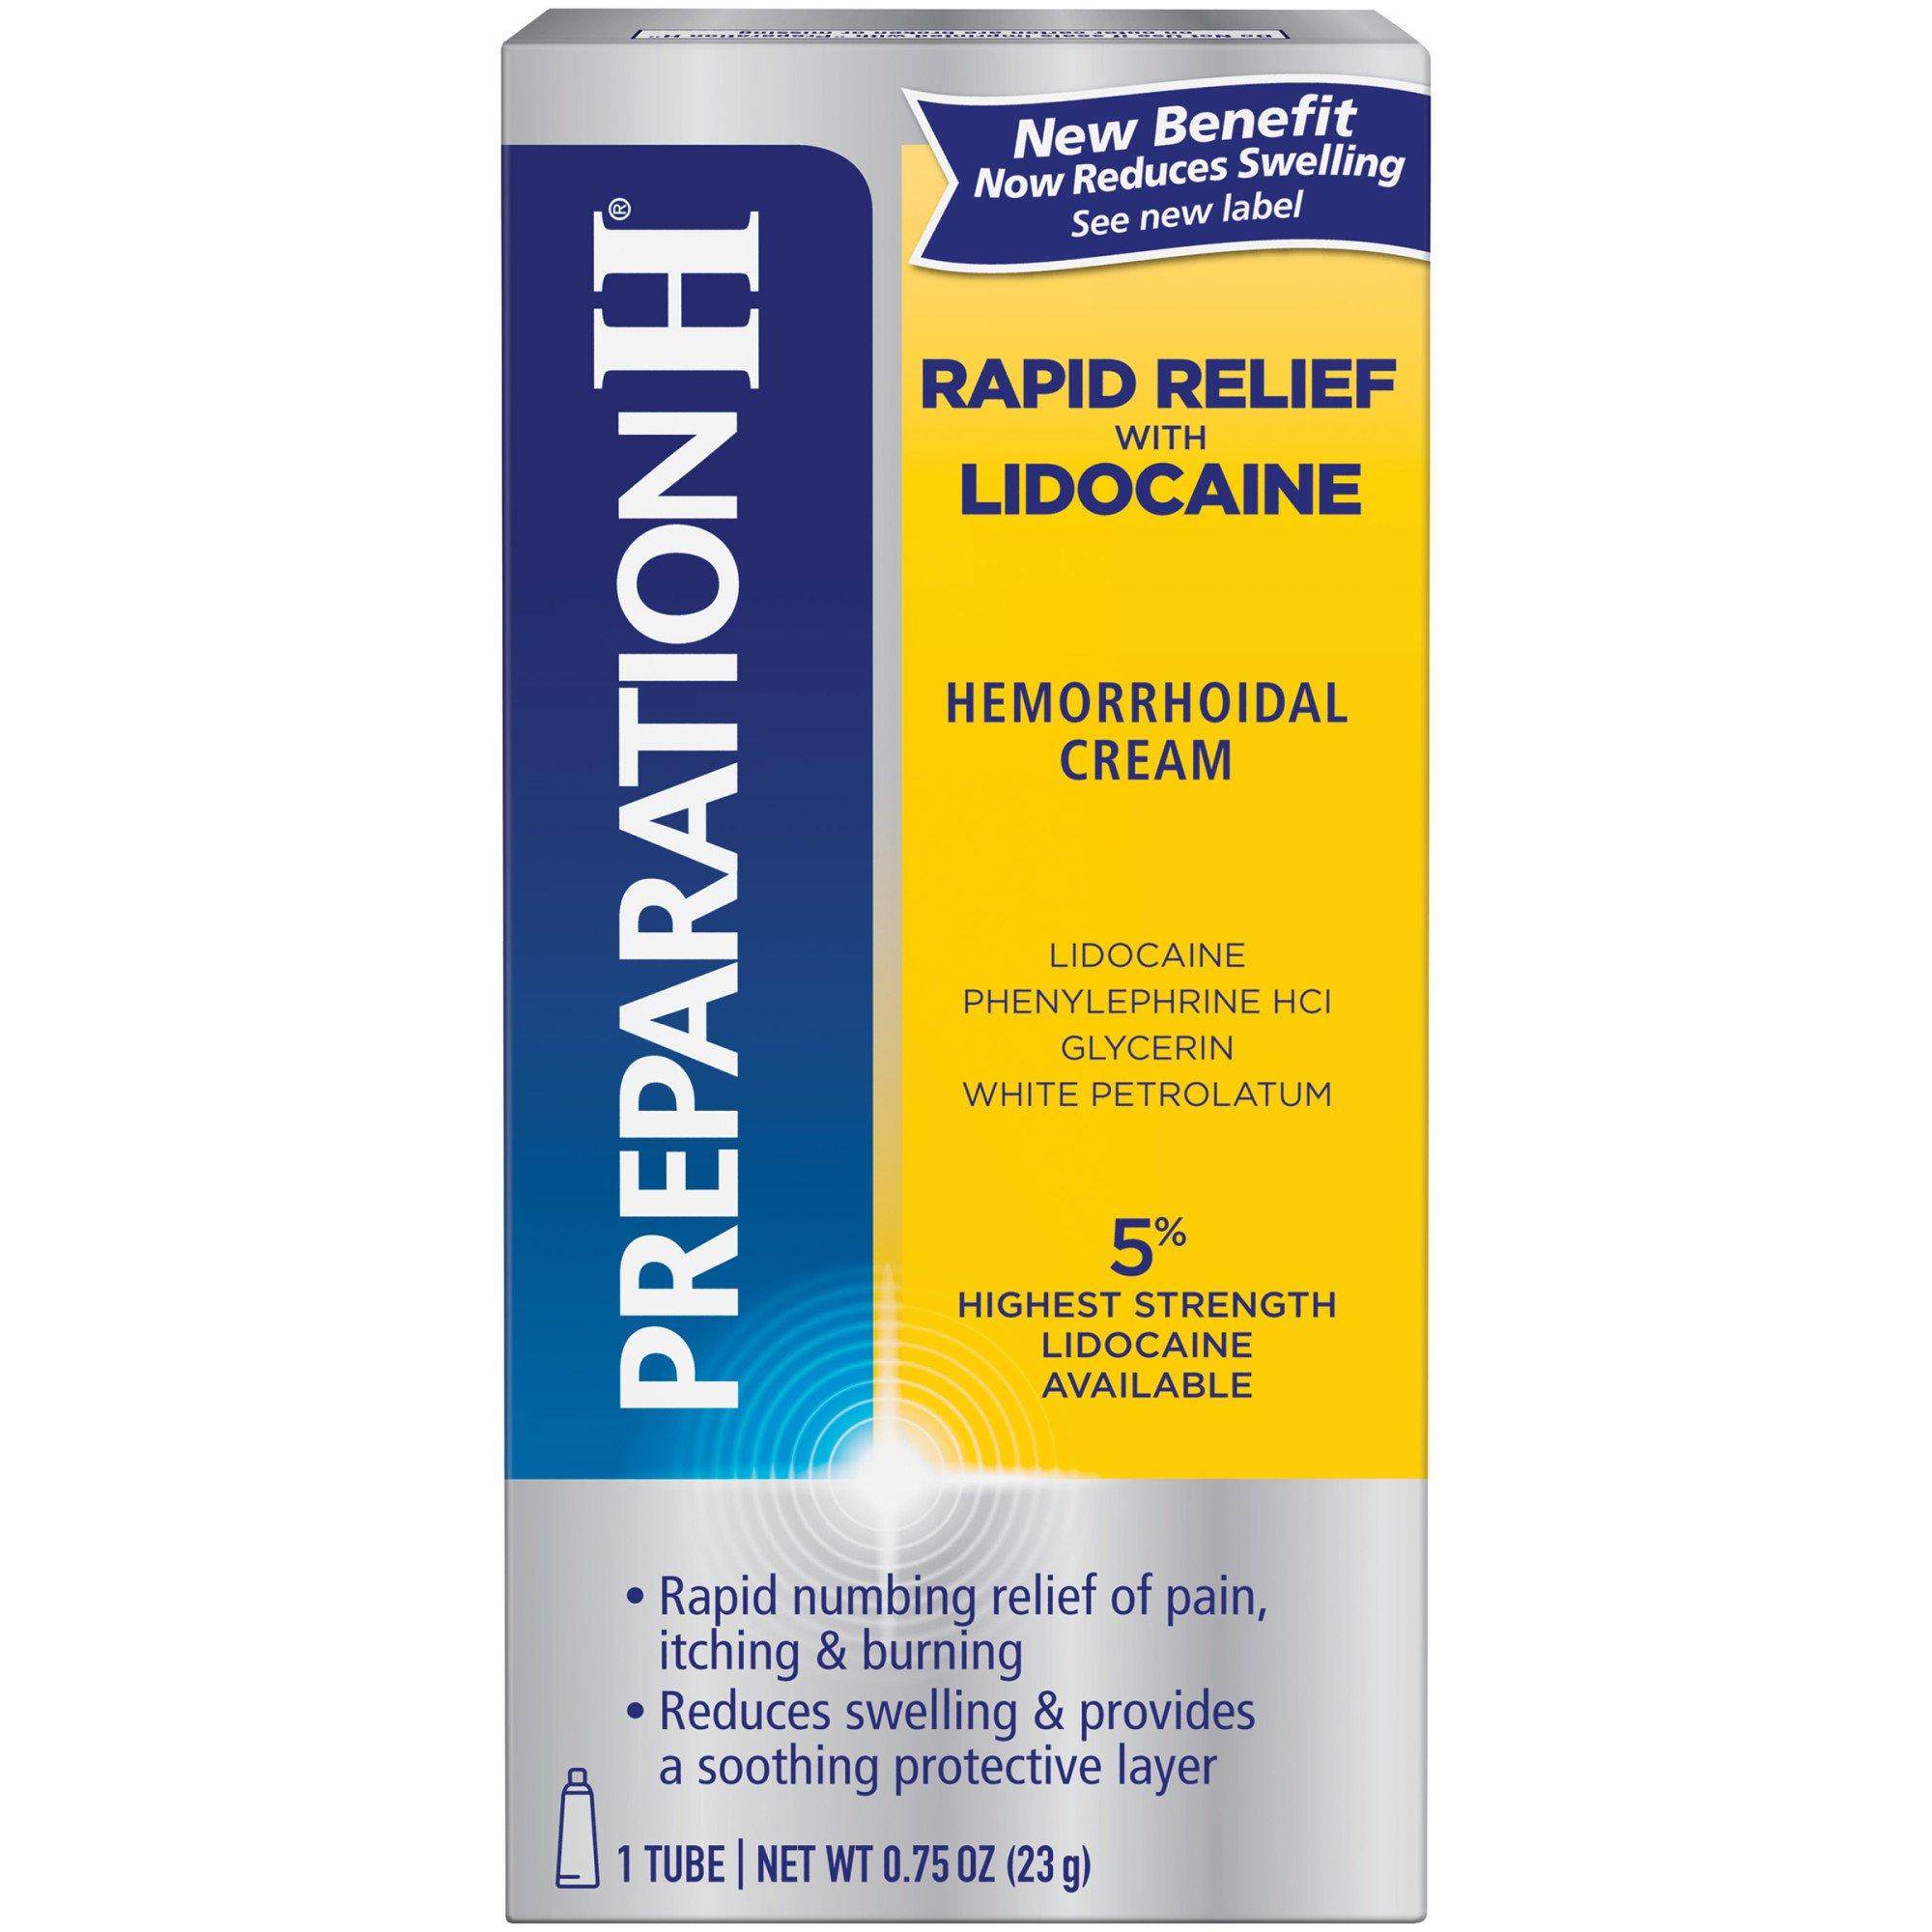 Preparation H Rapid Relief Wth Lidocaine Hemorrhoid Relief ...